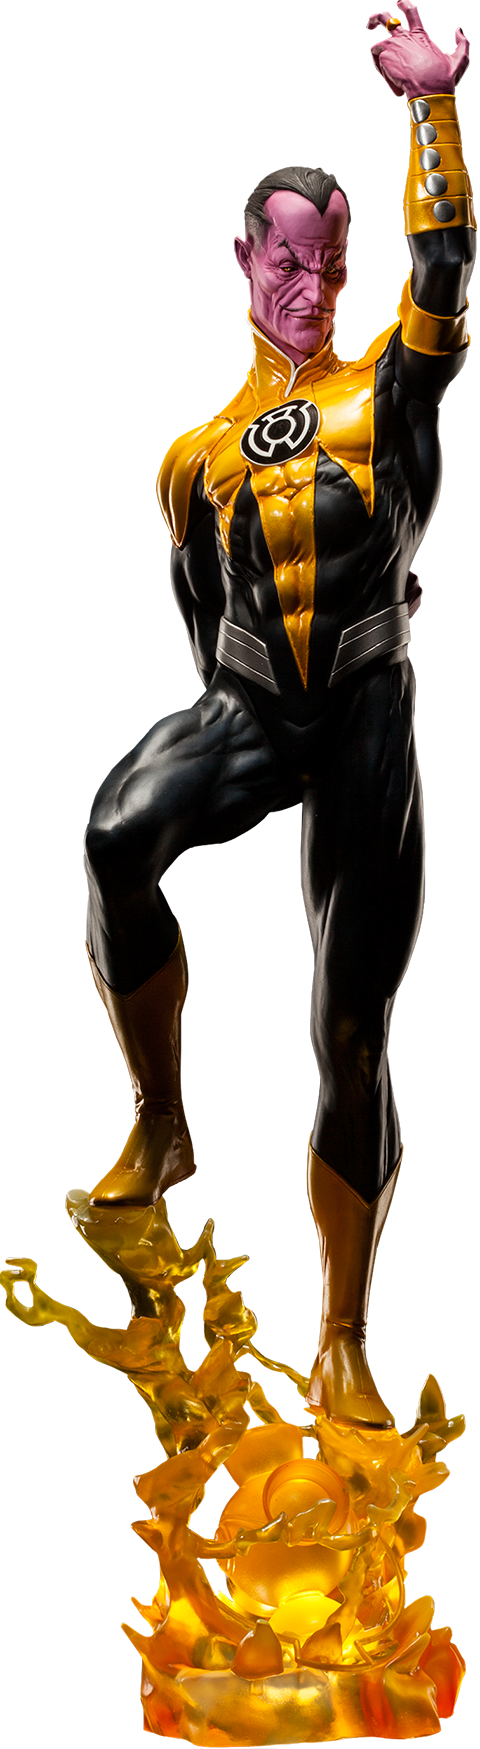 Sideshow Collectibles Sinestro Premium Format Figure